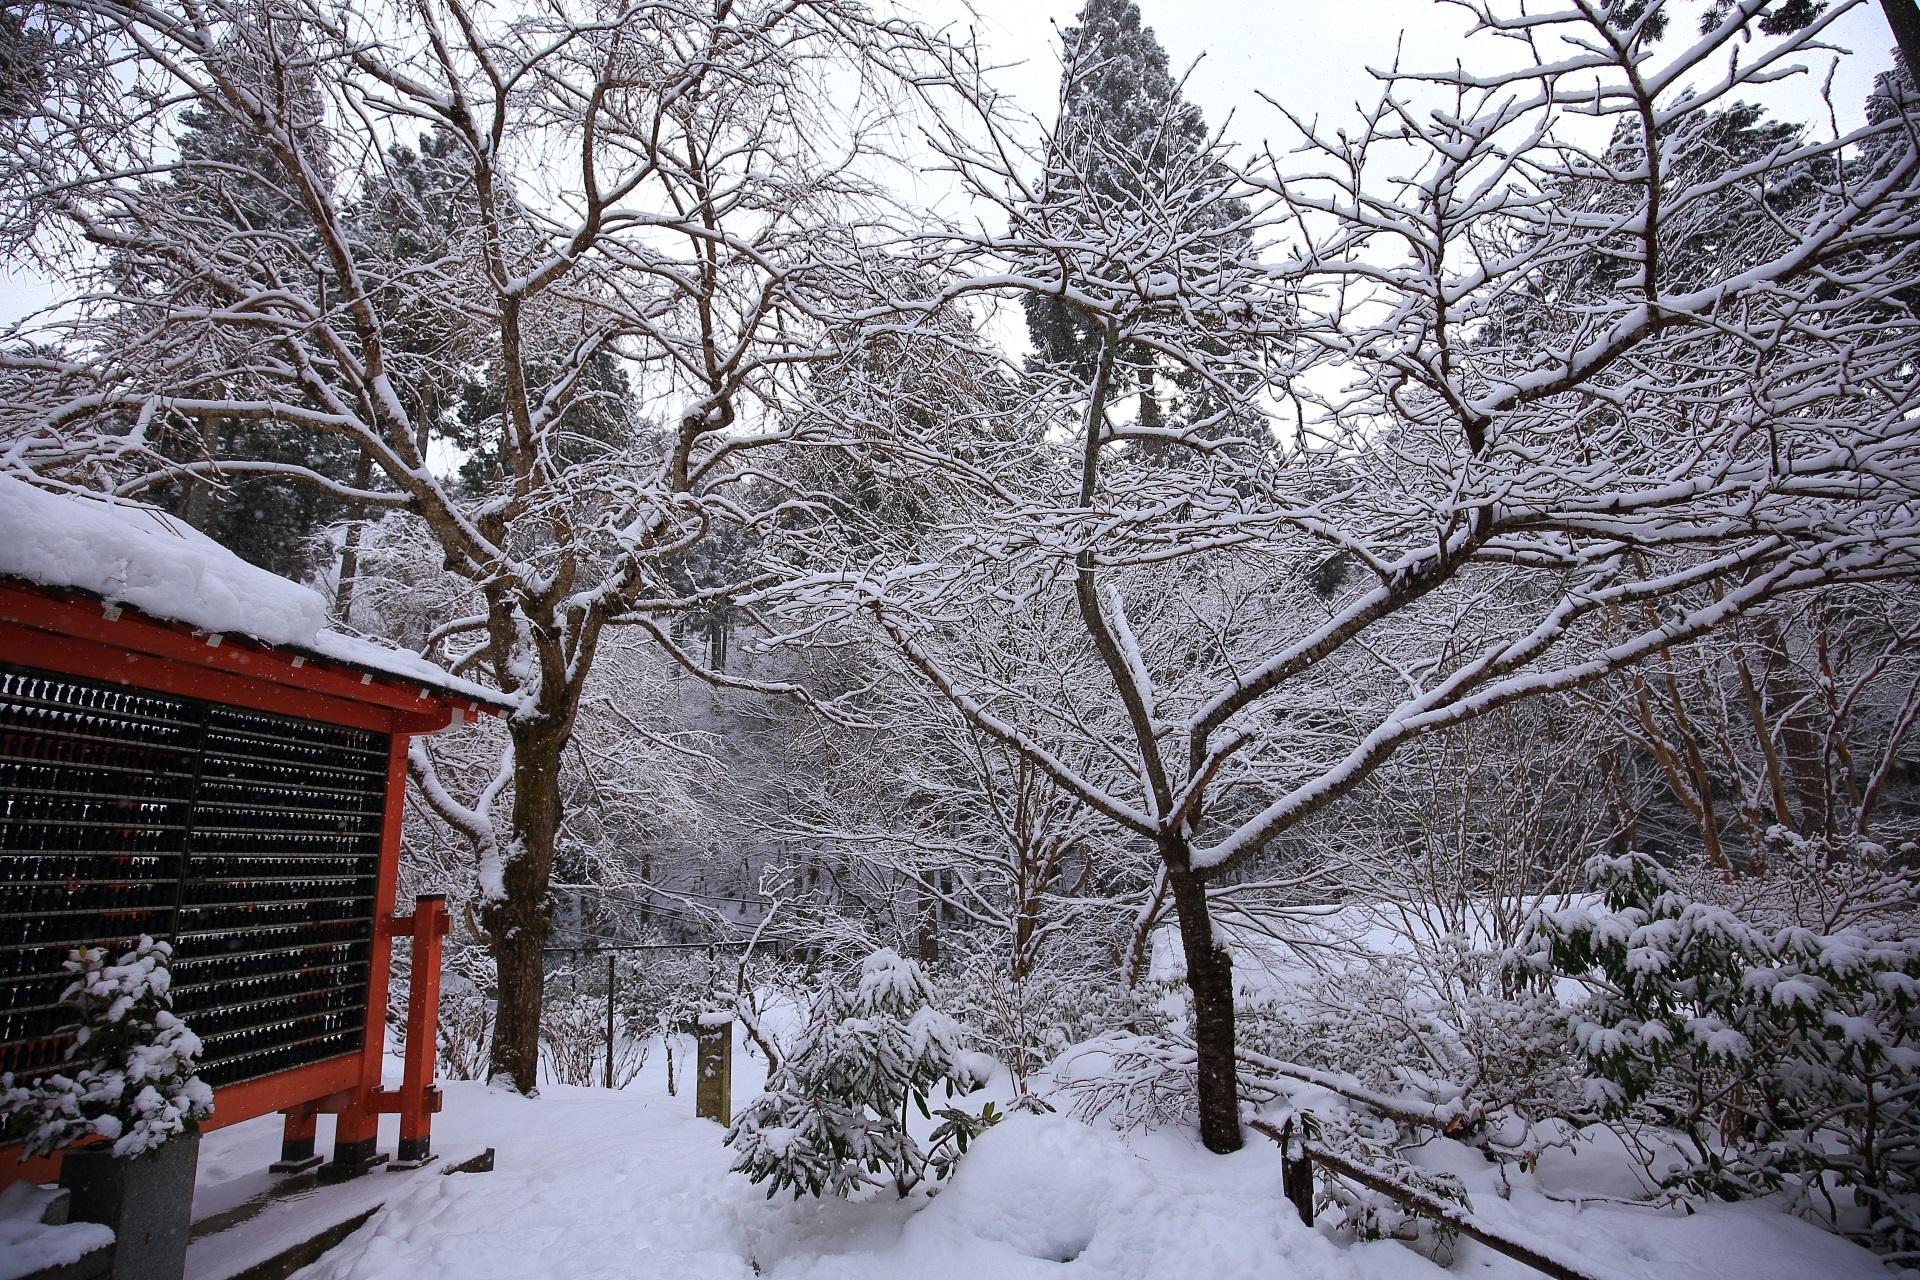 小観音像付近の雪景色